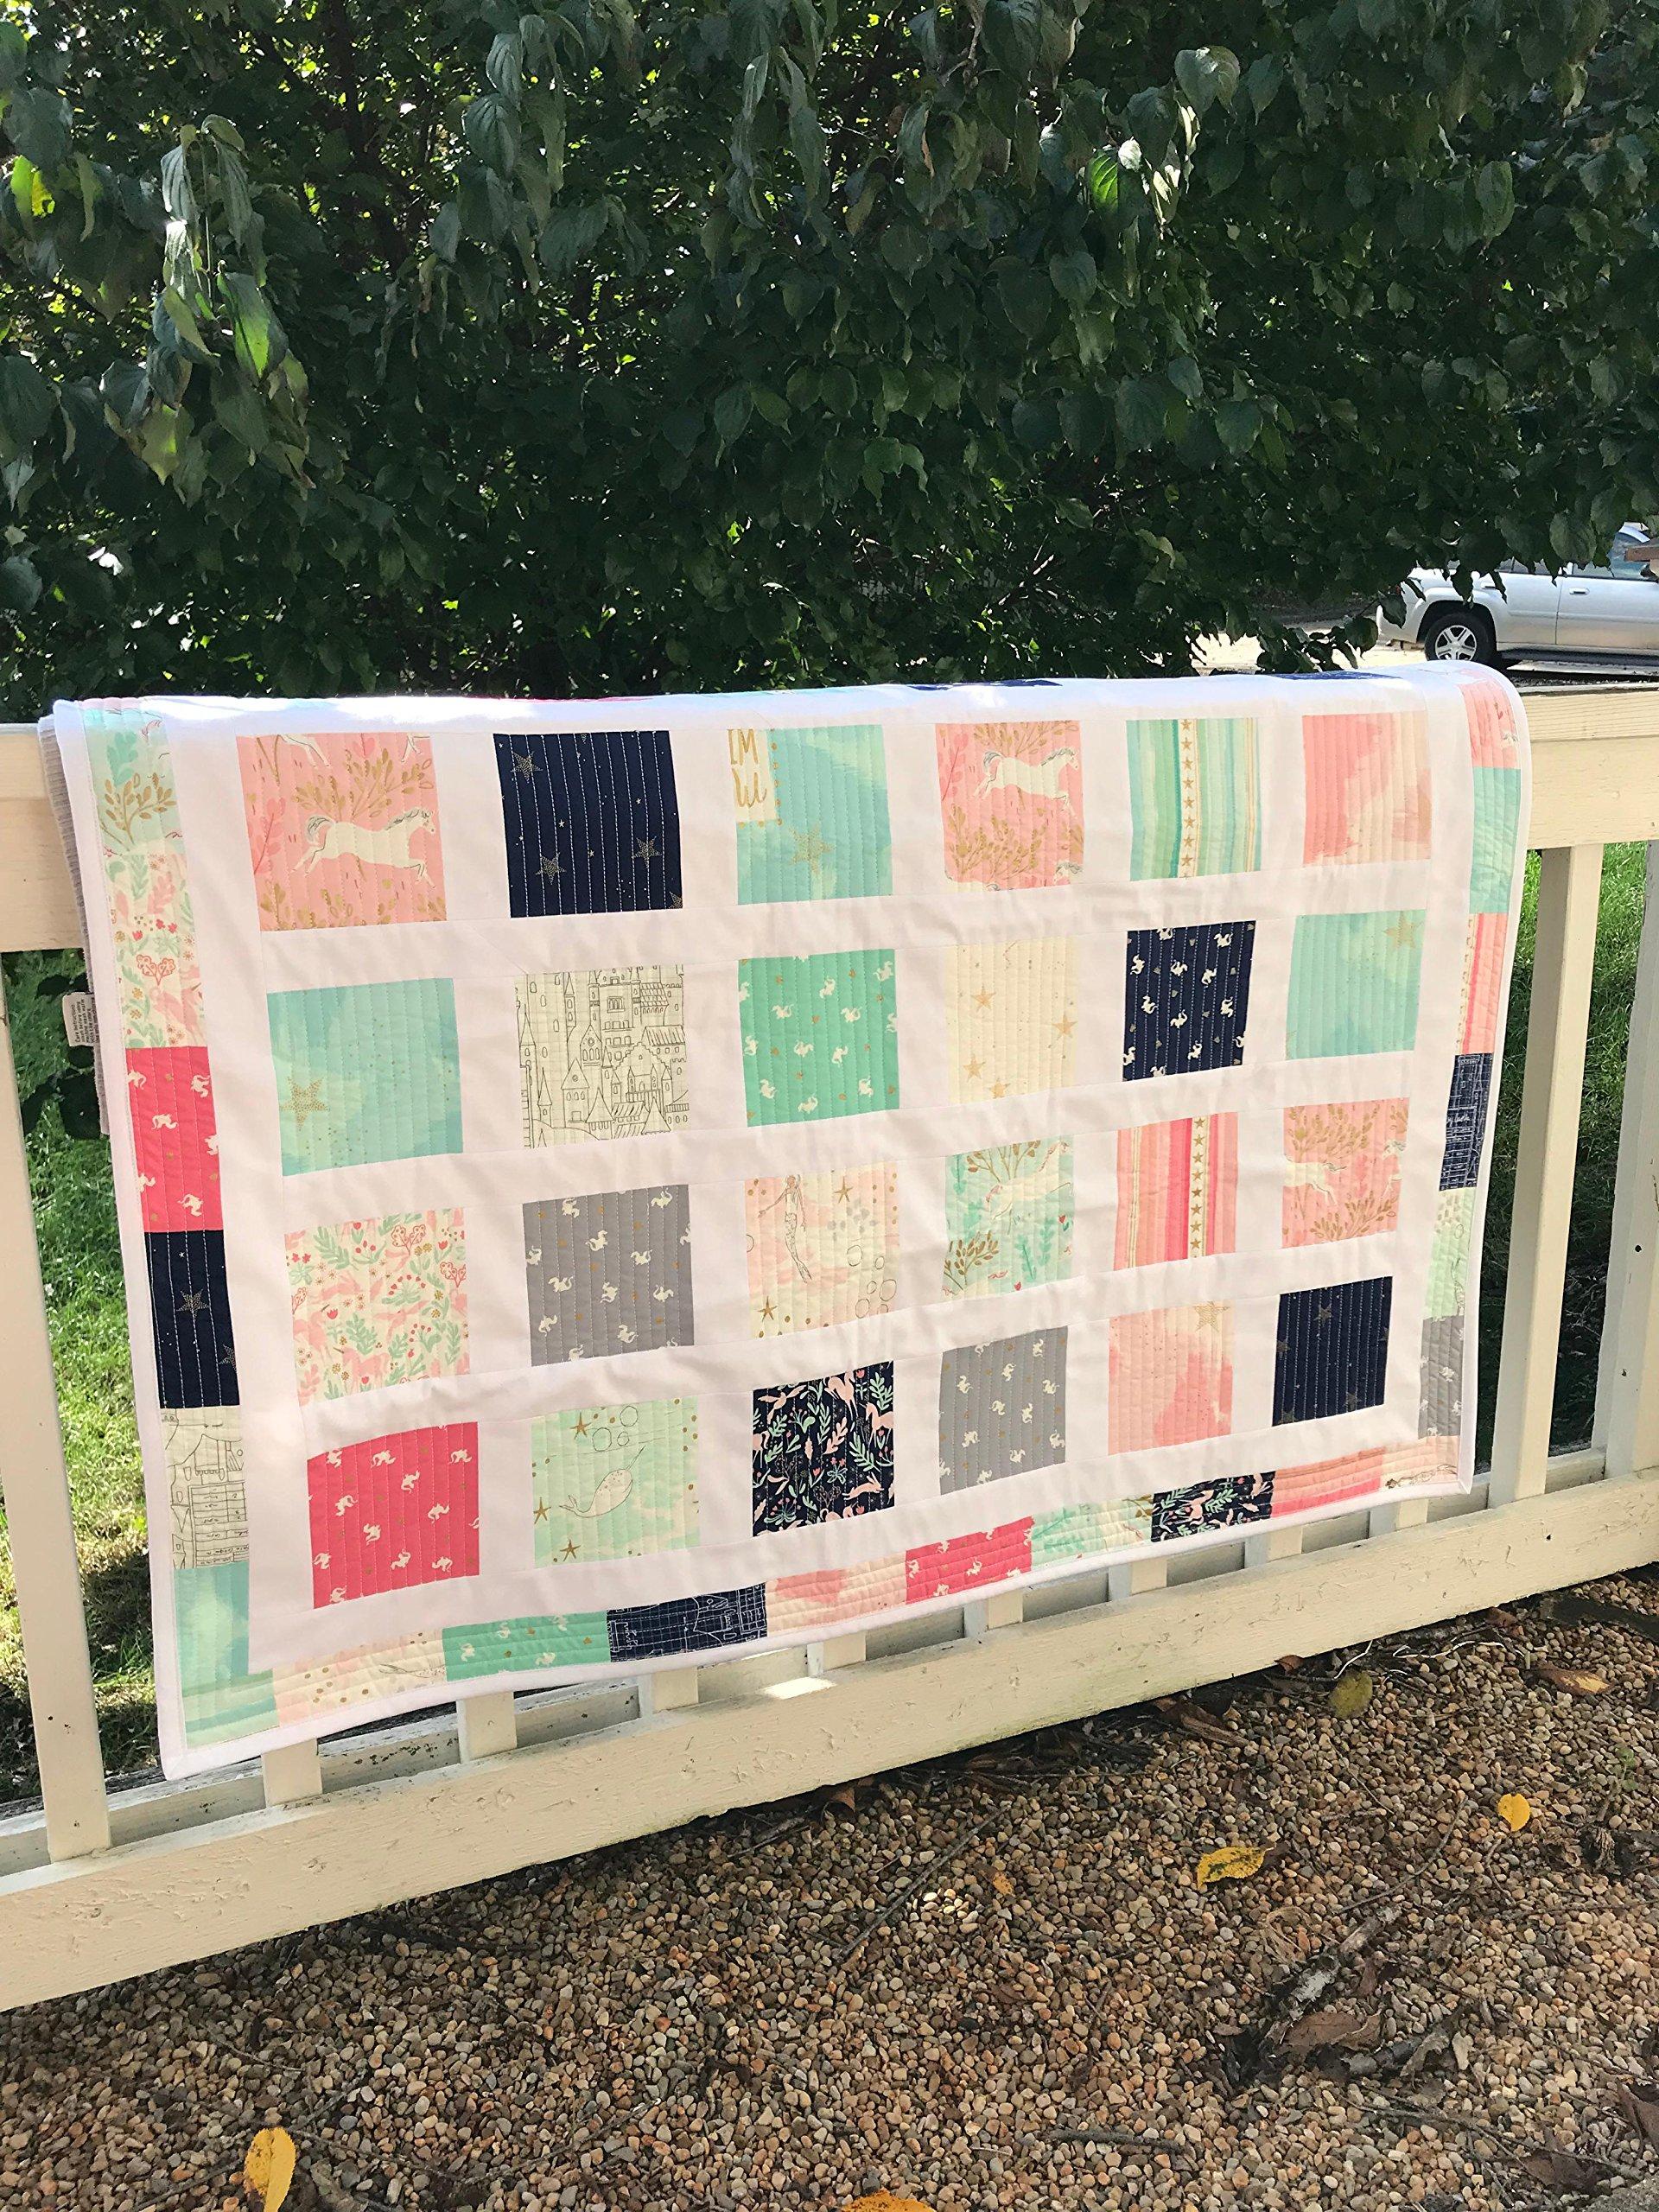 Mermaid Quilt - Unicorn Quilt - Baby Quilt - Toddler Bedding - Homemade Baby Quilt - Baby Blanket - Heirloom Quilt - Modern Baby Quilt